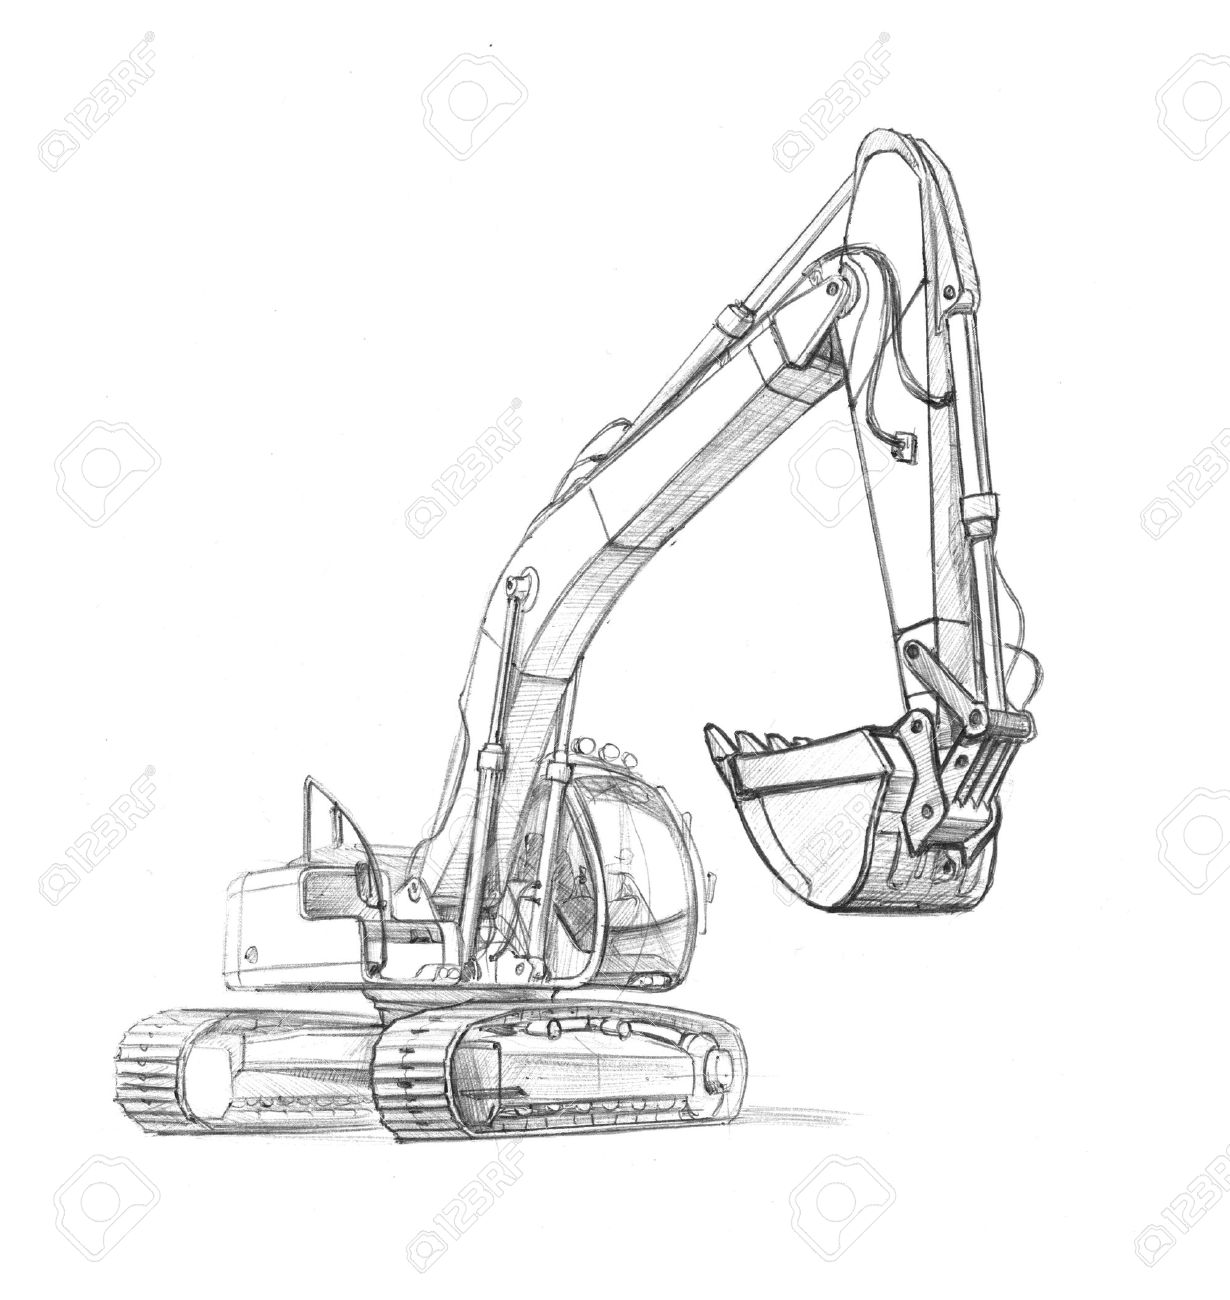 drawing excavator - 17587496